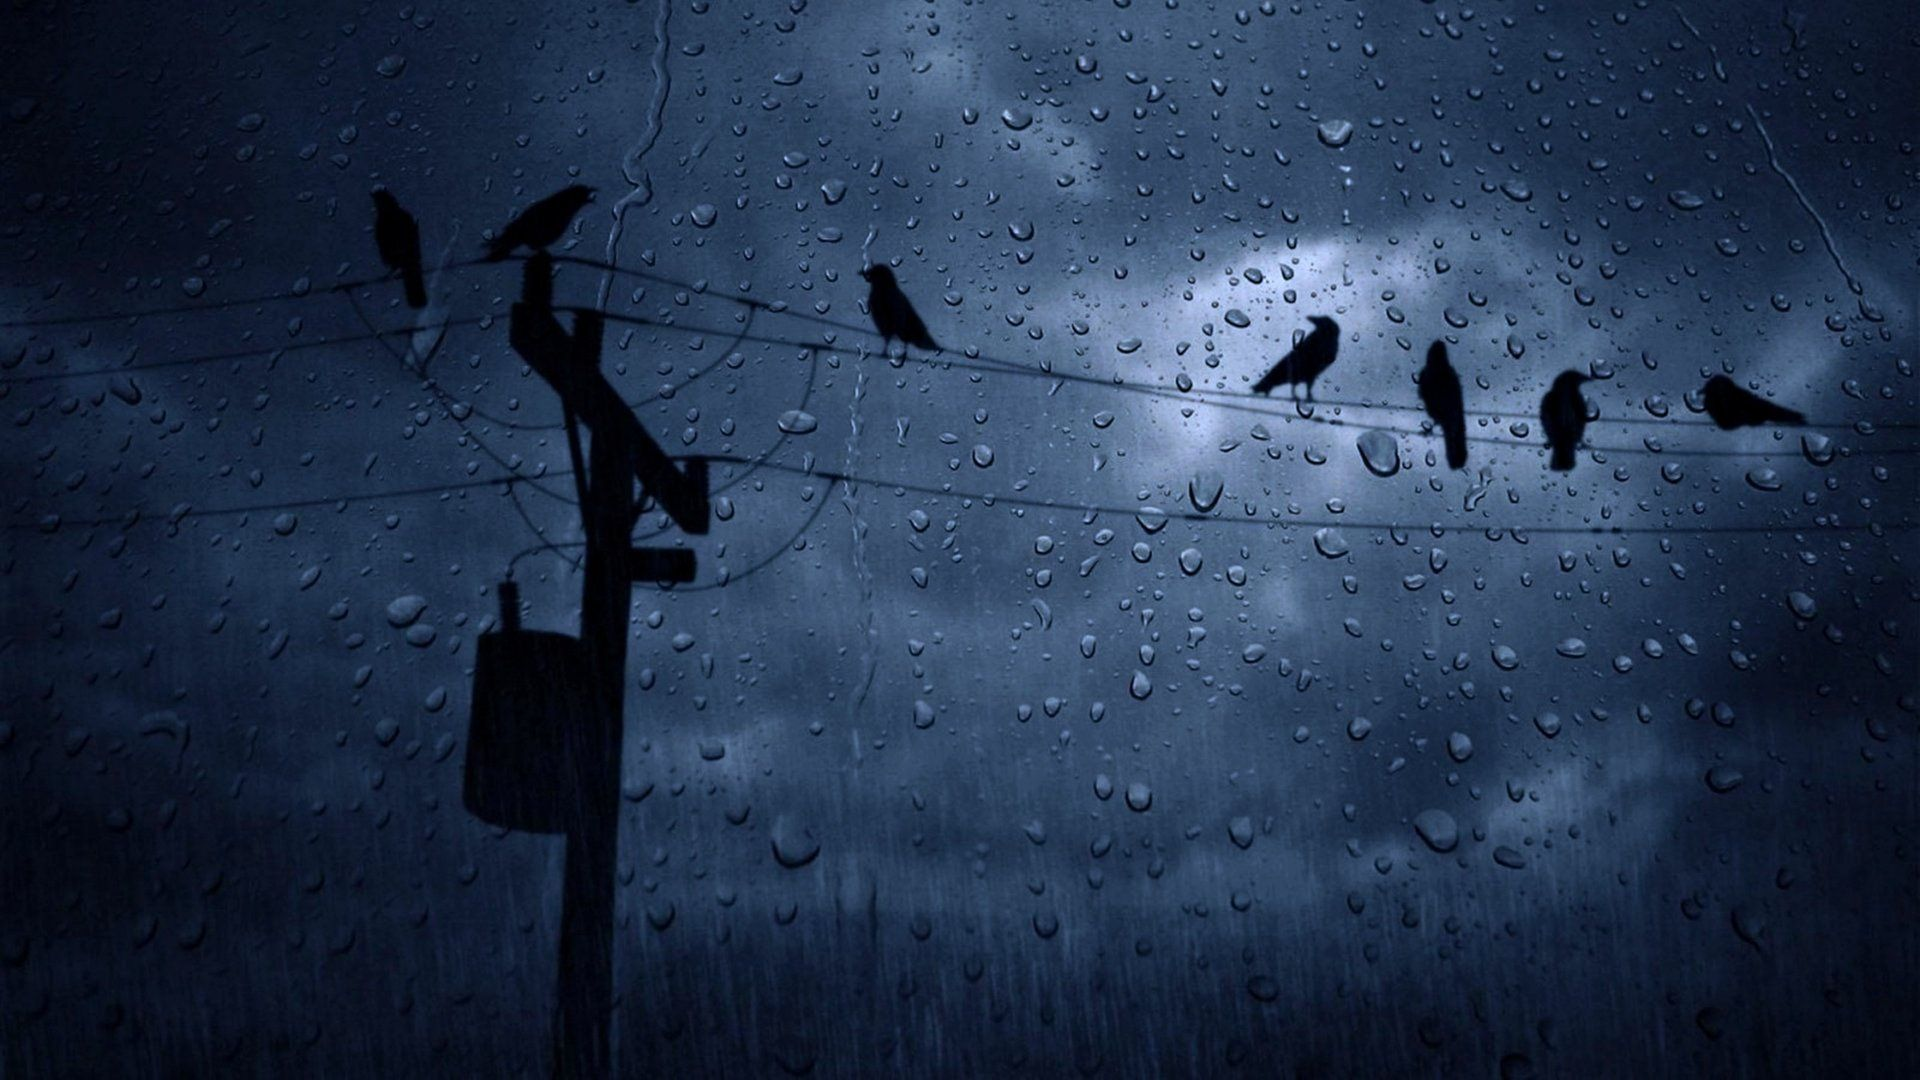 weather_rain_birds_winter_cloudy_sky_3840x2160.jpg